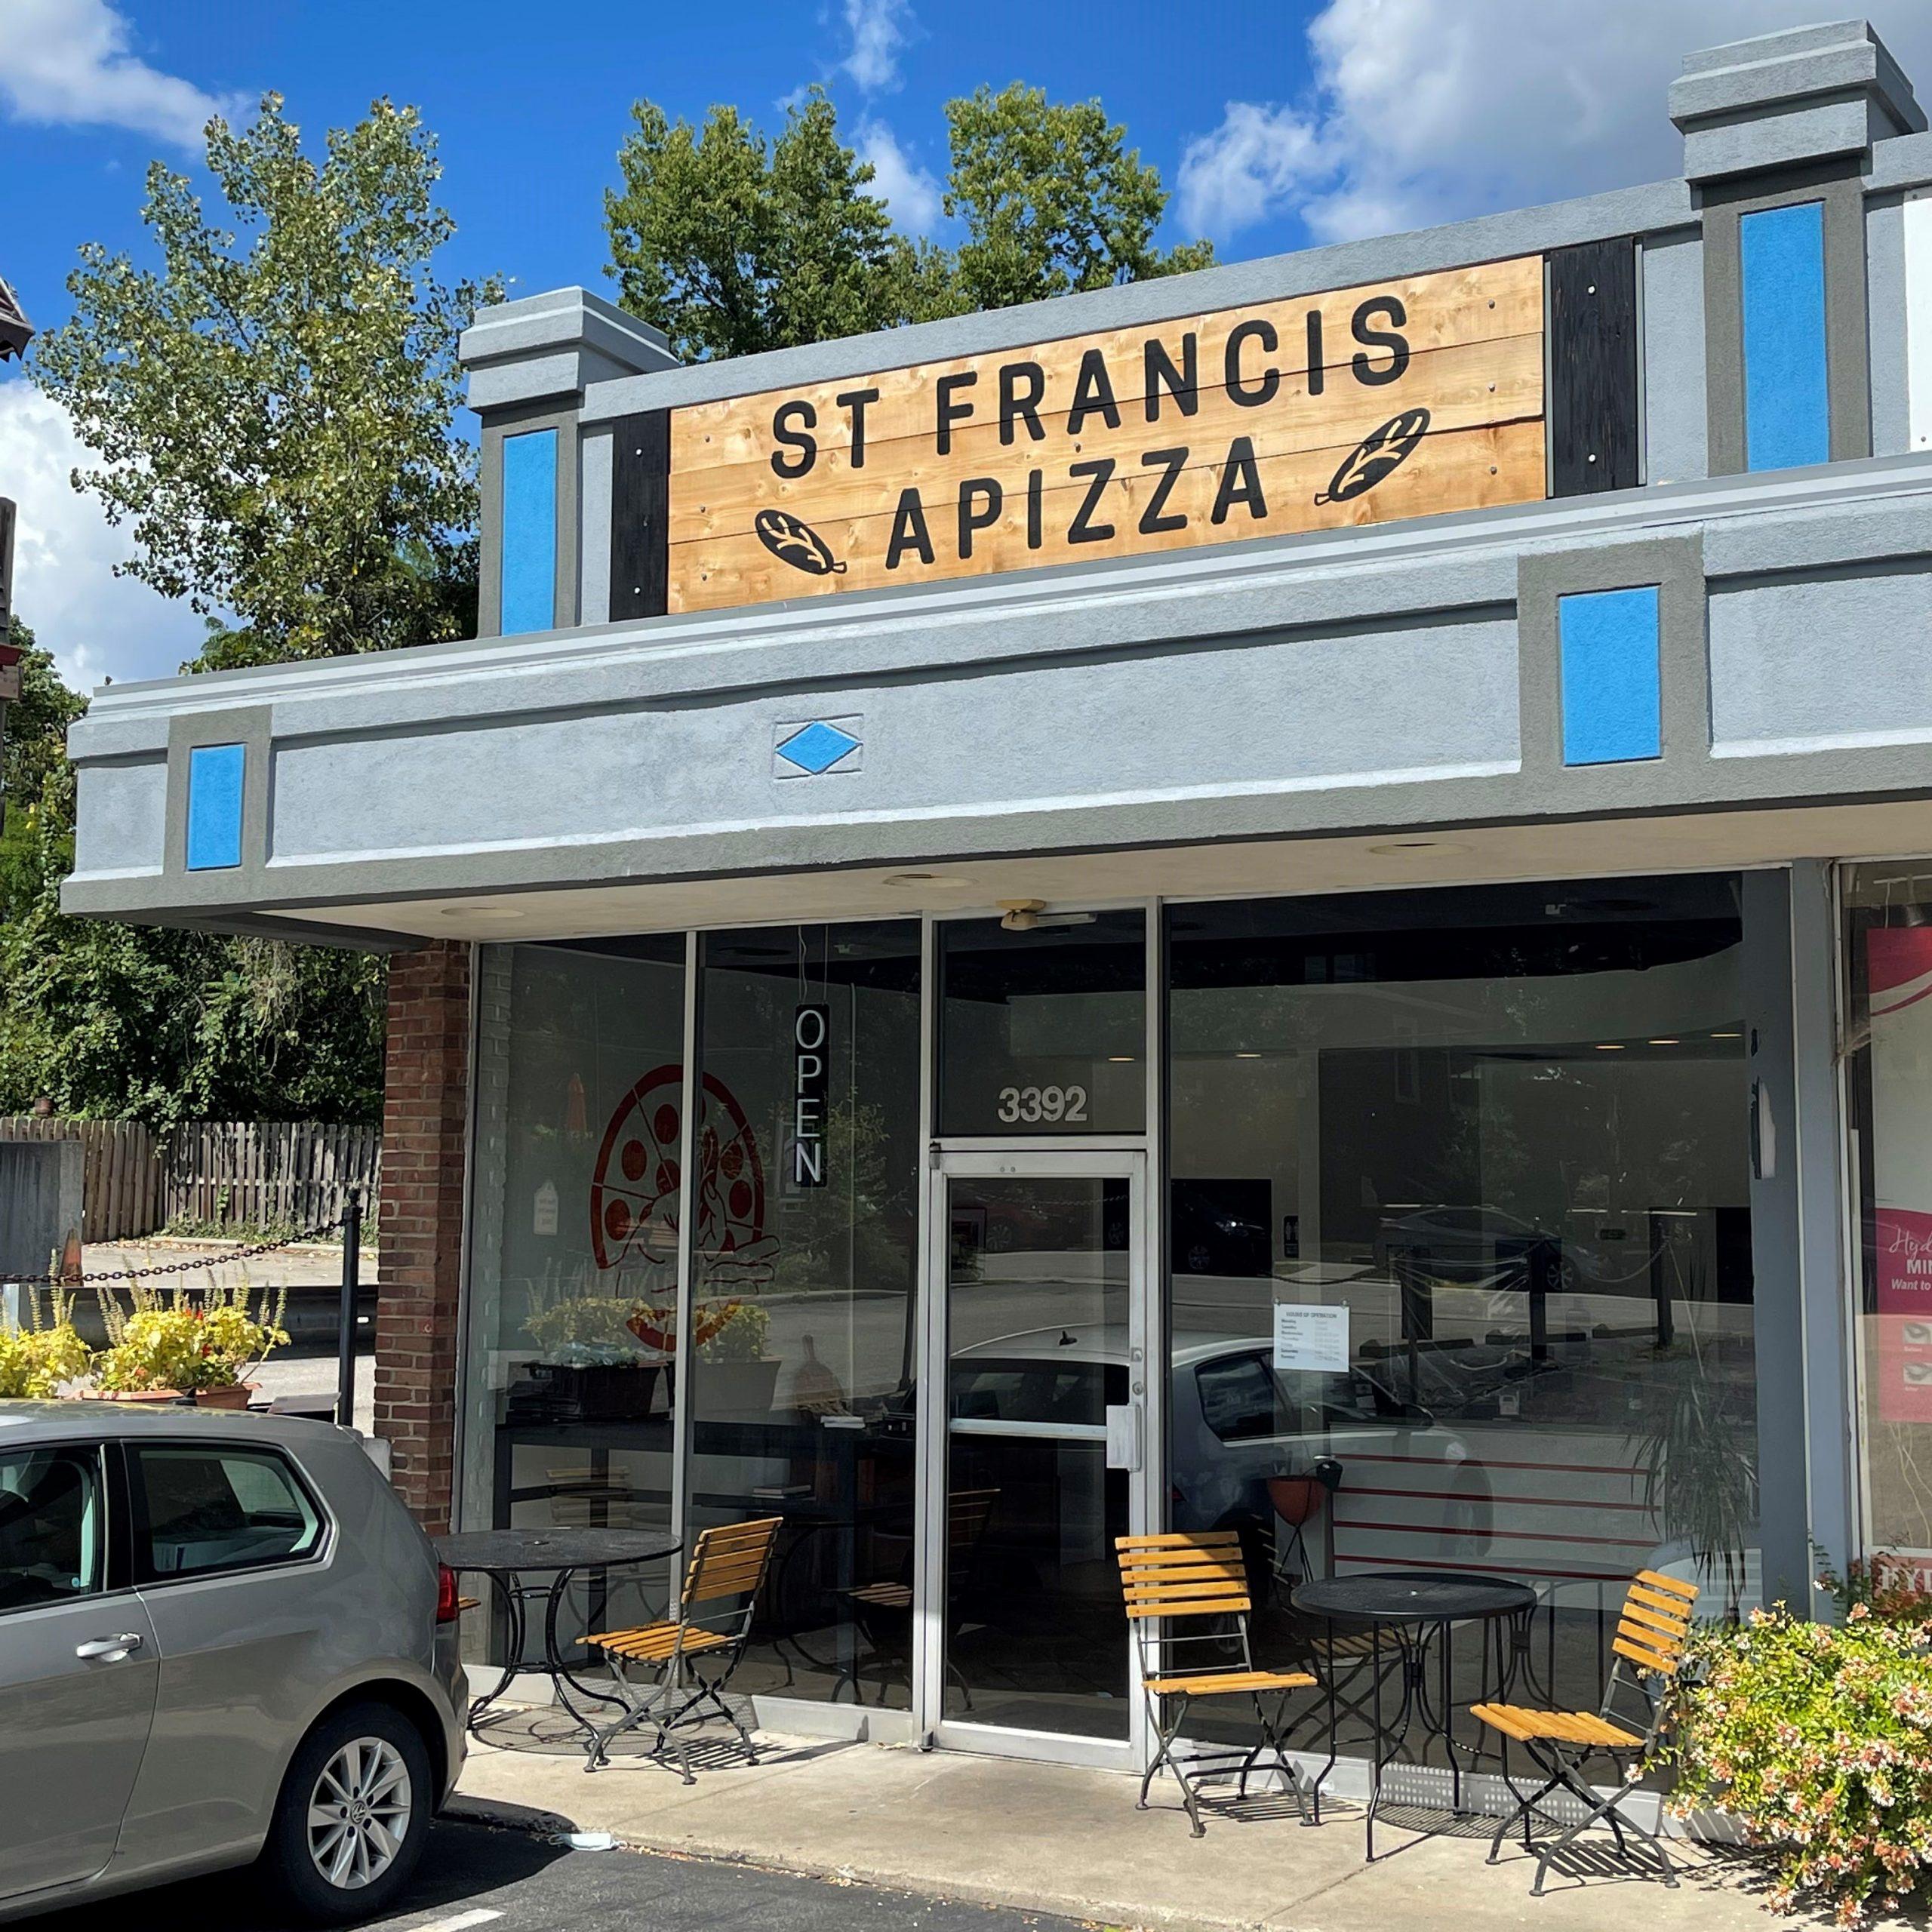 Saint Francis Apizza